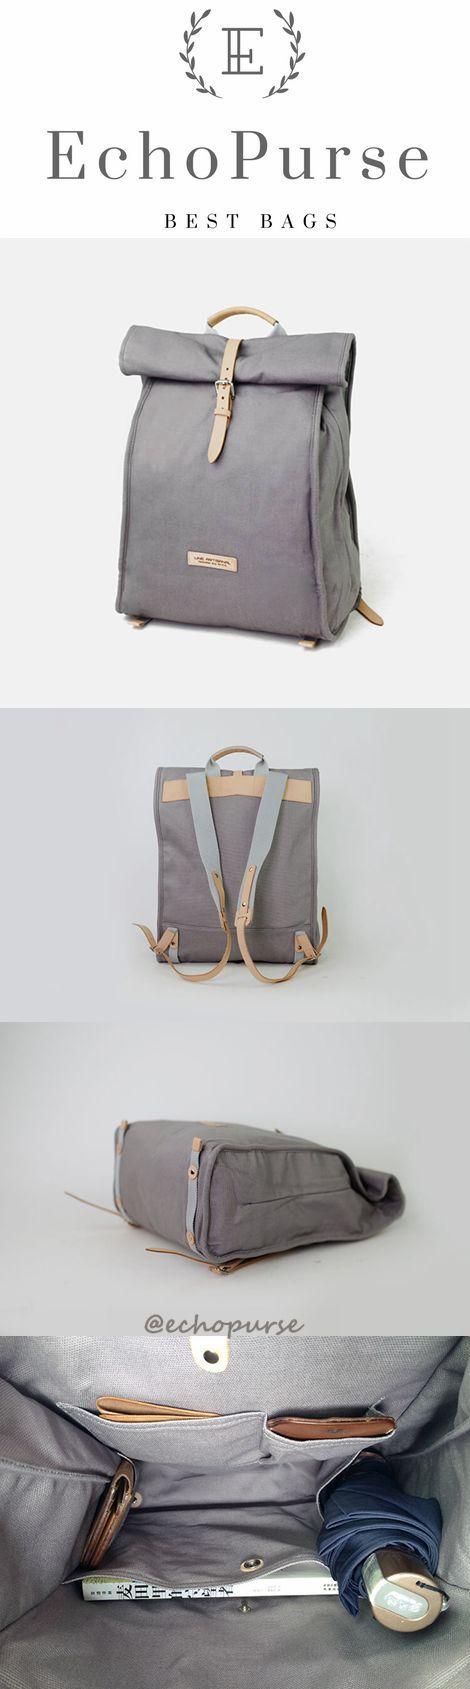 Vintage Canvas Backpack, Travel Racksacks, Ladle Cover School Bag H03